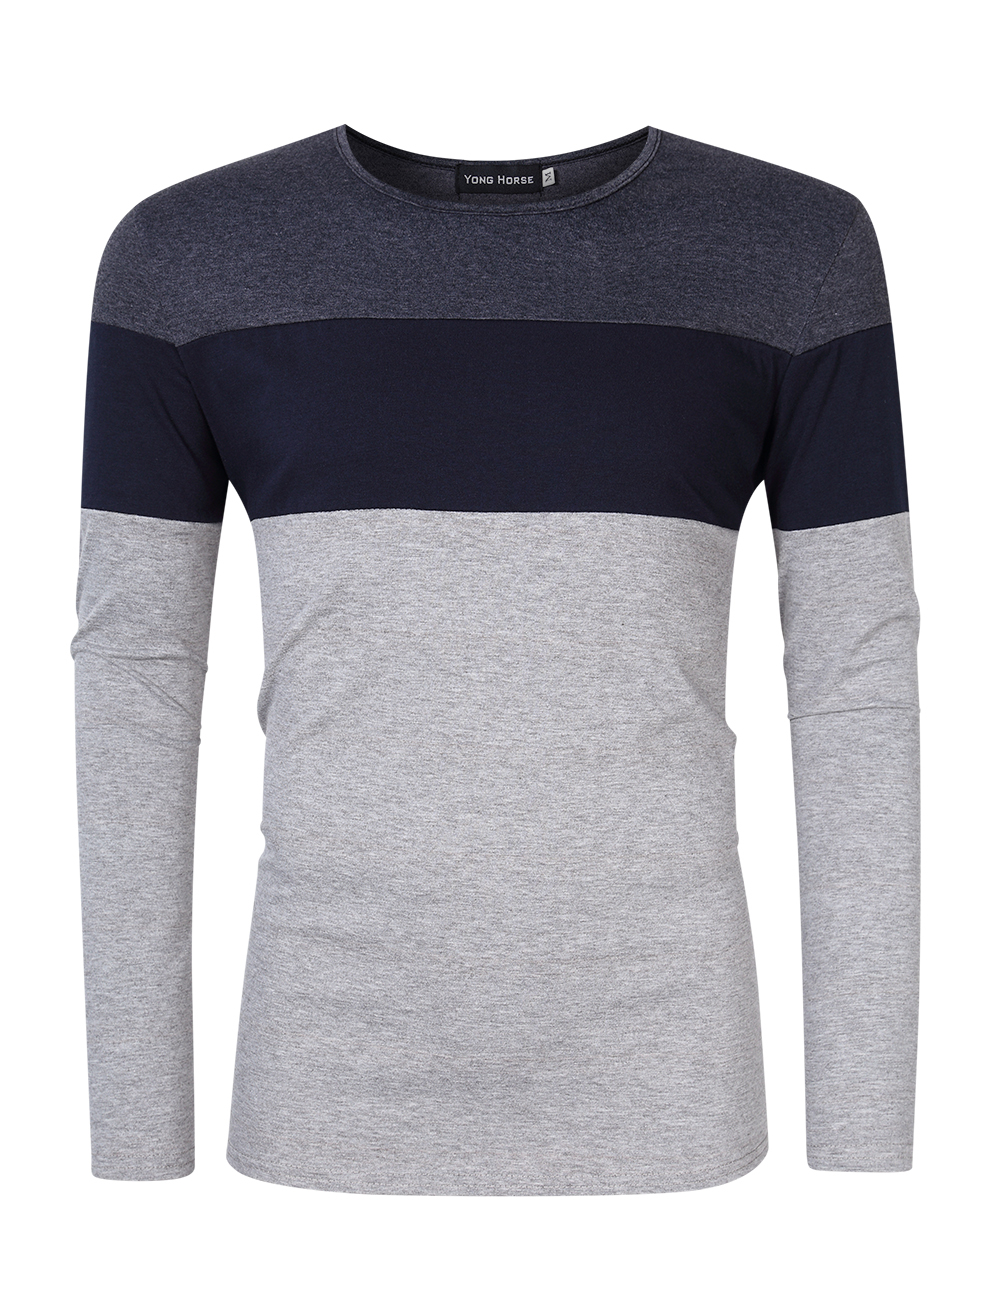 [US Direct] Yong Horse Men's Color Block Slim Fit Crew Neck Long Sleeve Basic Cotton T-Shirt Dark gray + sapphire blue_XXL